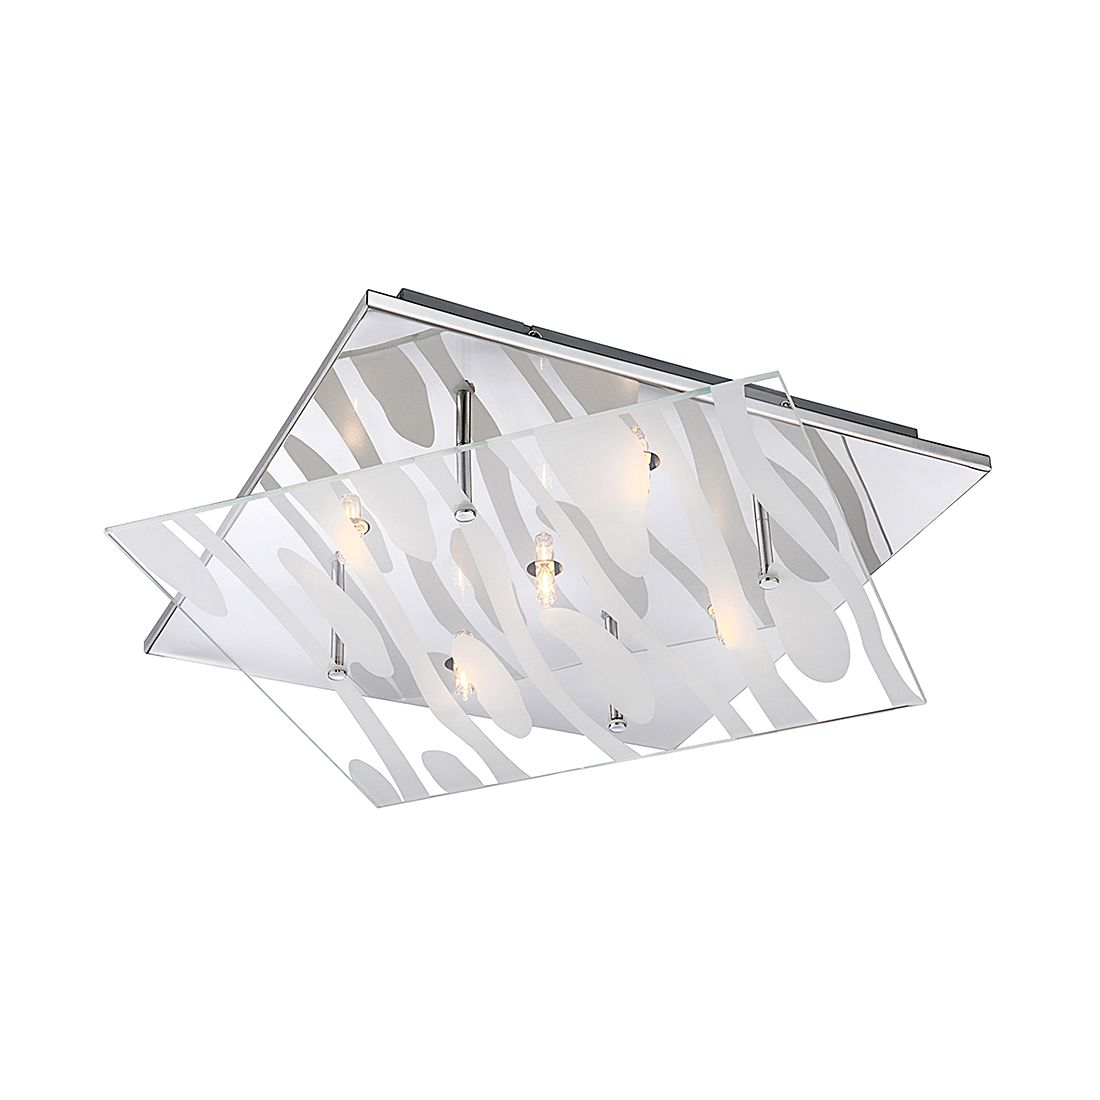 EEK A++, Deckenleuchte DL METALL CHROM, 5XG9 – Metall – Silber – 5-flammig, Globo Lighting günstig kaufen